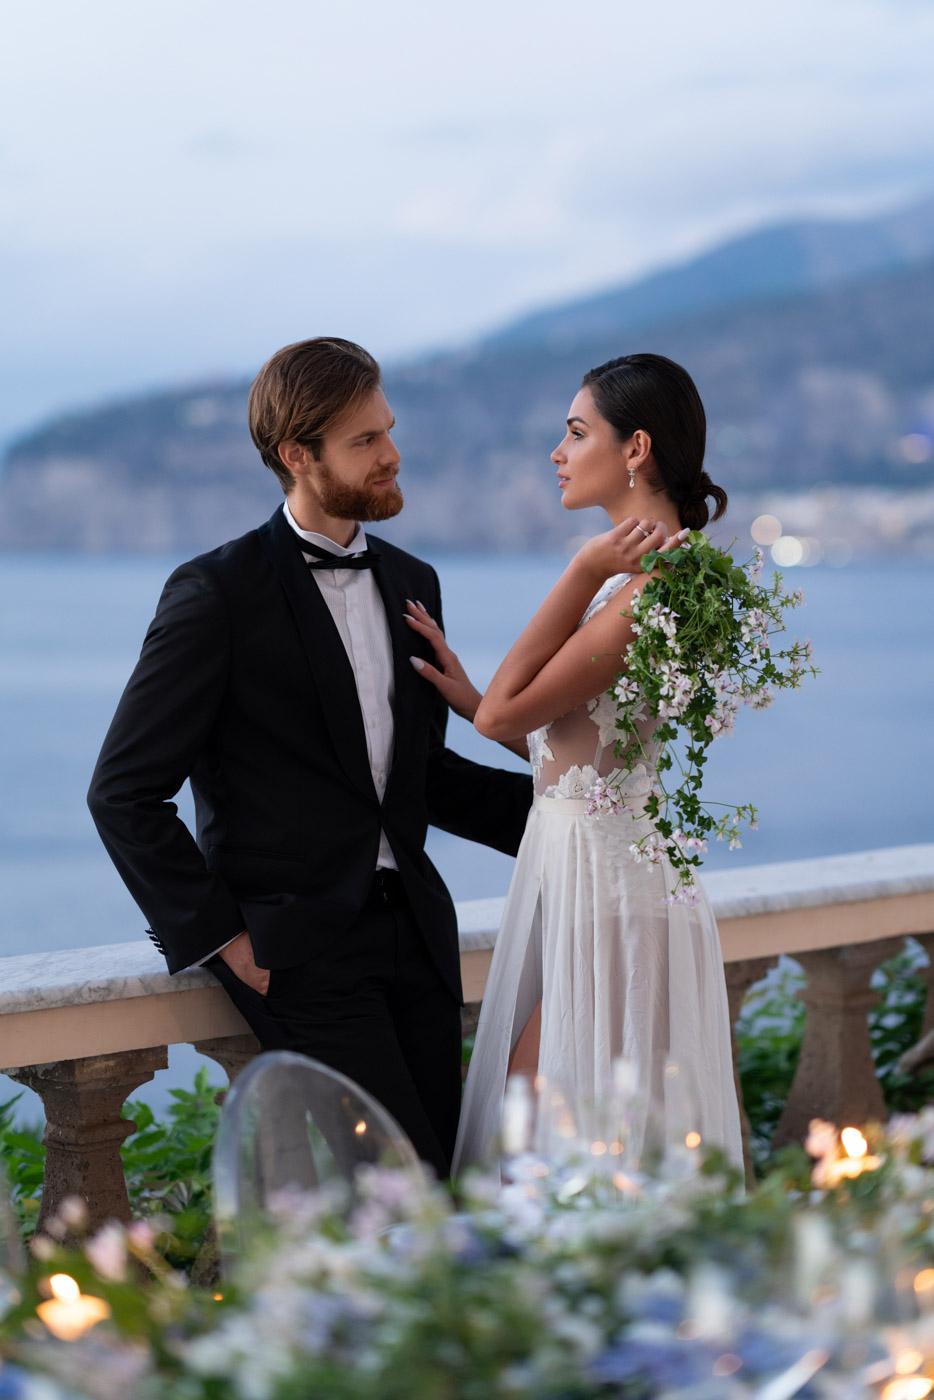 Wedding florals designed by Eddie Zaratsian at Villa Astor, Sorrento, Italy - photo by Adagion Studio